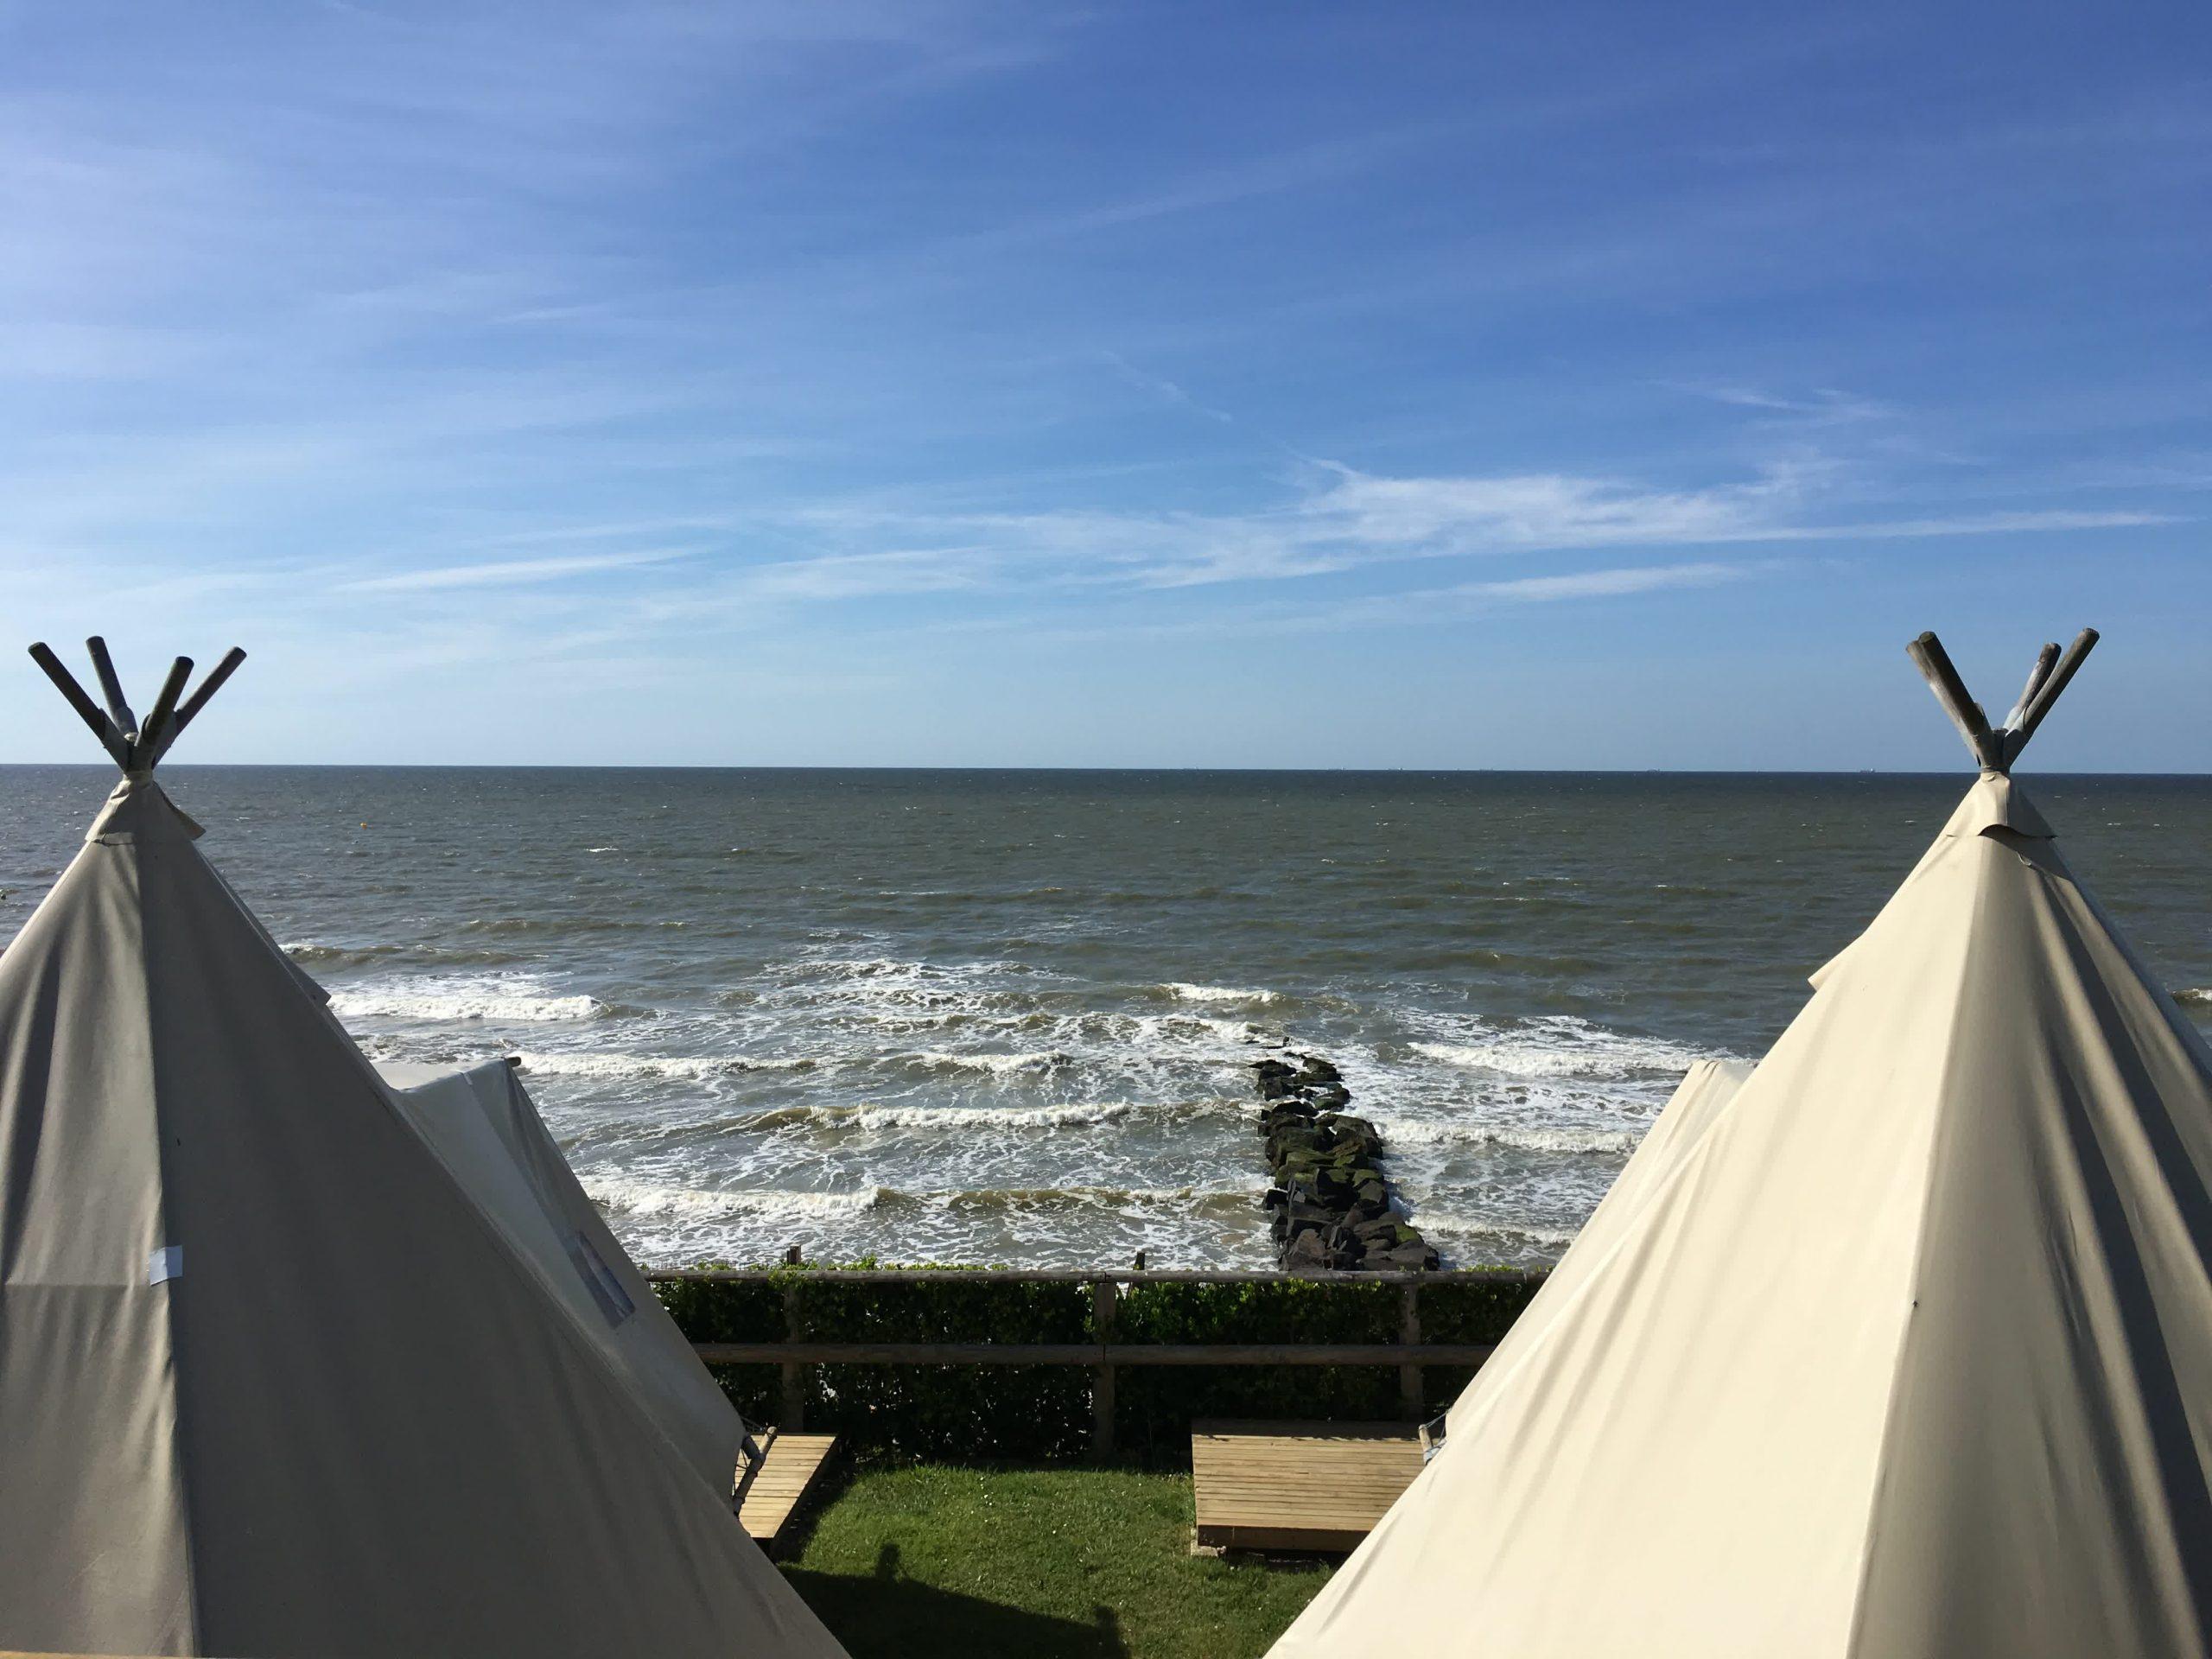 vue_tipi_camping_de_la_plage_houlgate